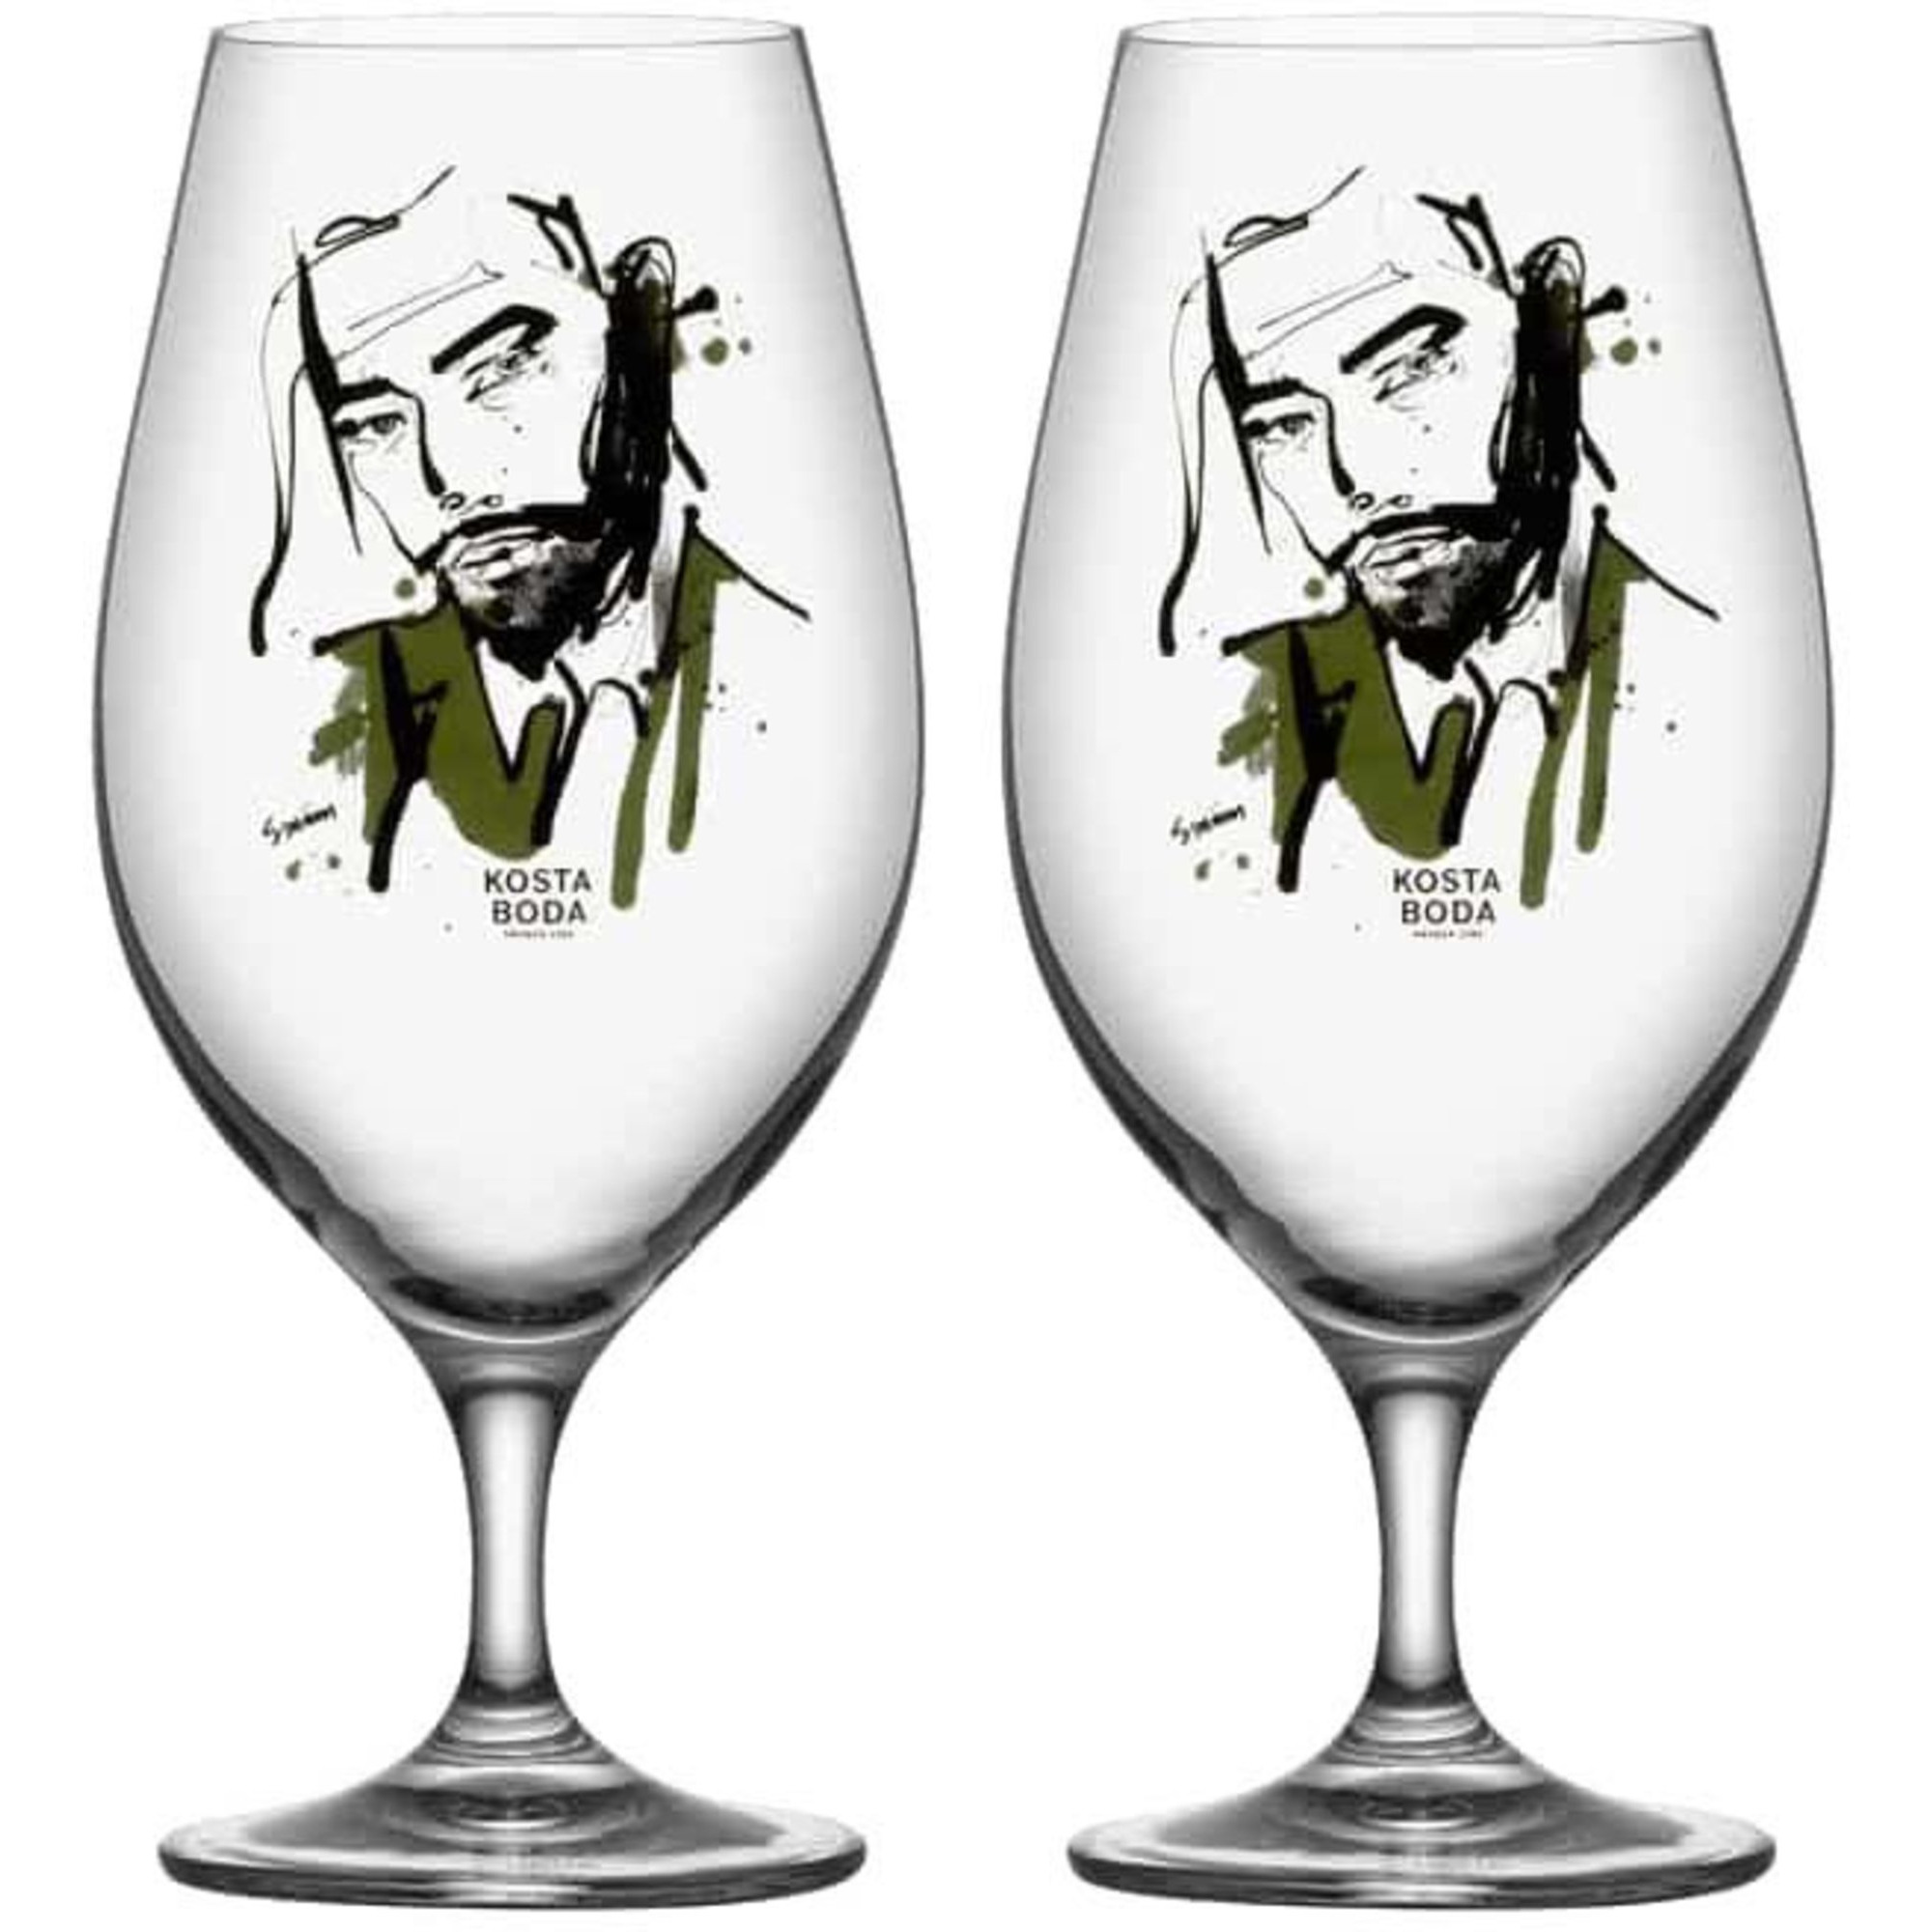 Kosta Boda All About You Ölglas/ Want Him Grön 2-Pack